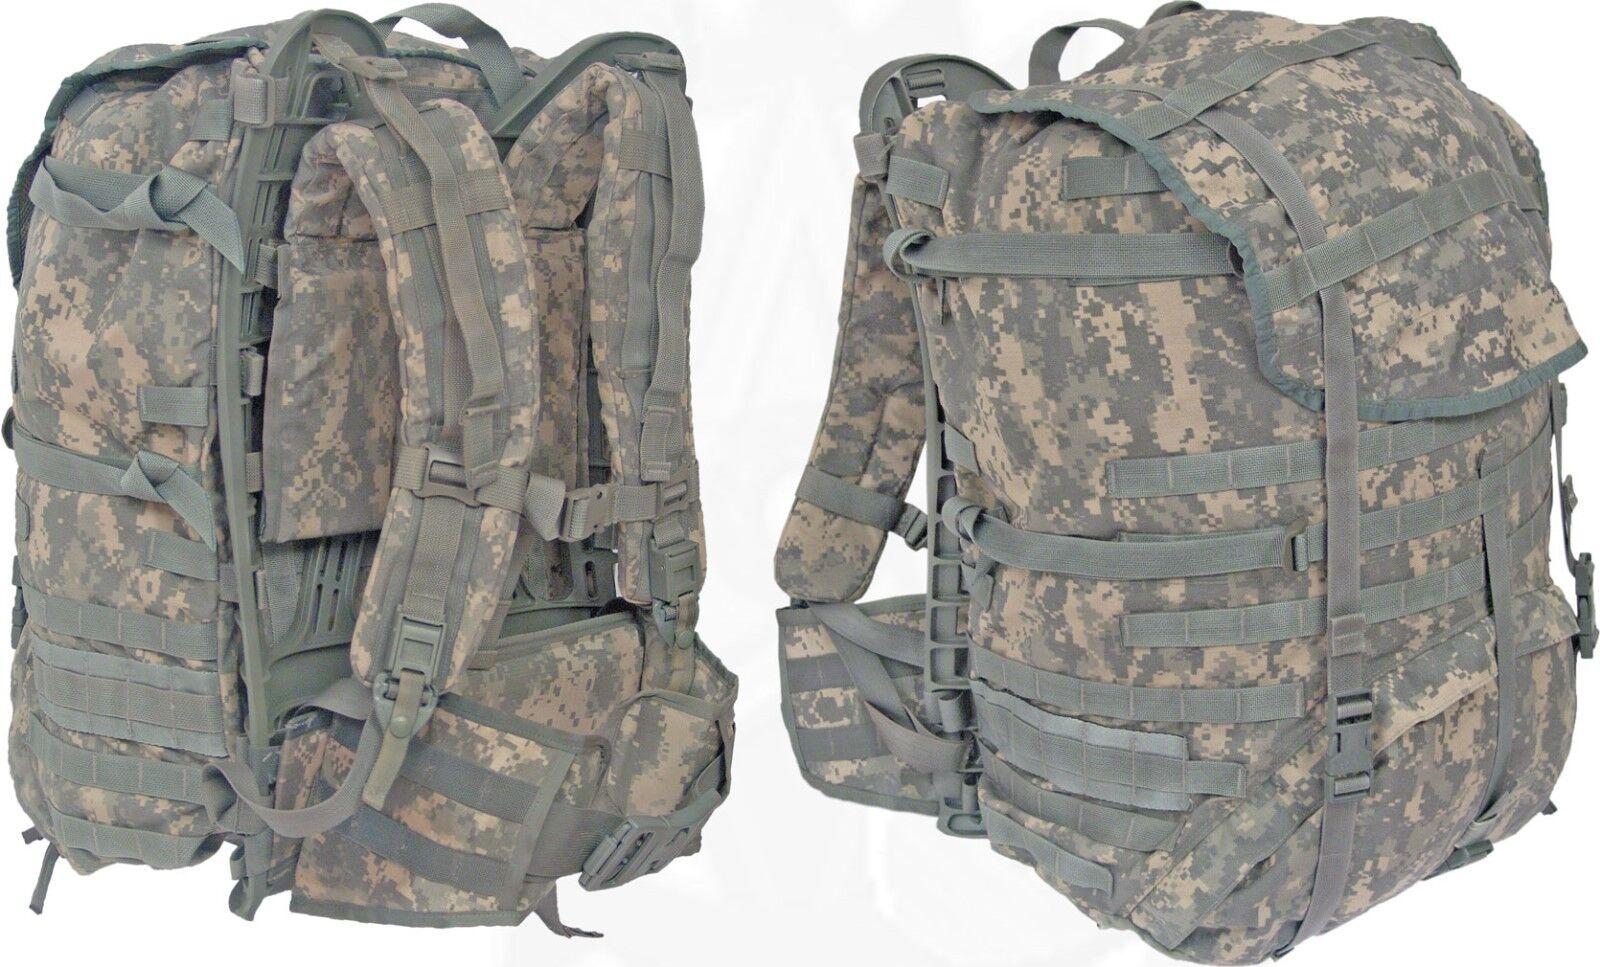 KT Pair Military Forces Camouflage PLCE Side Pouches BTP MTP style Camo MOLLE